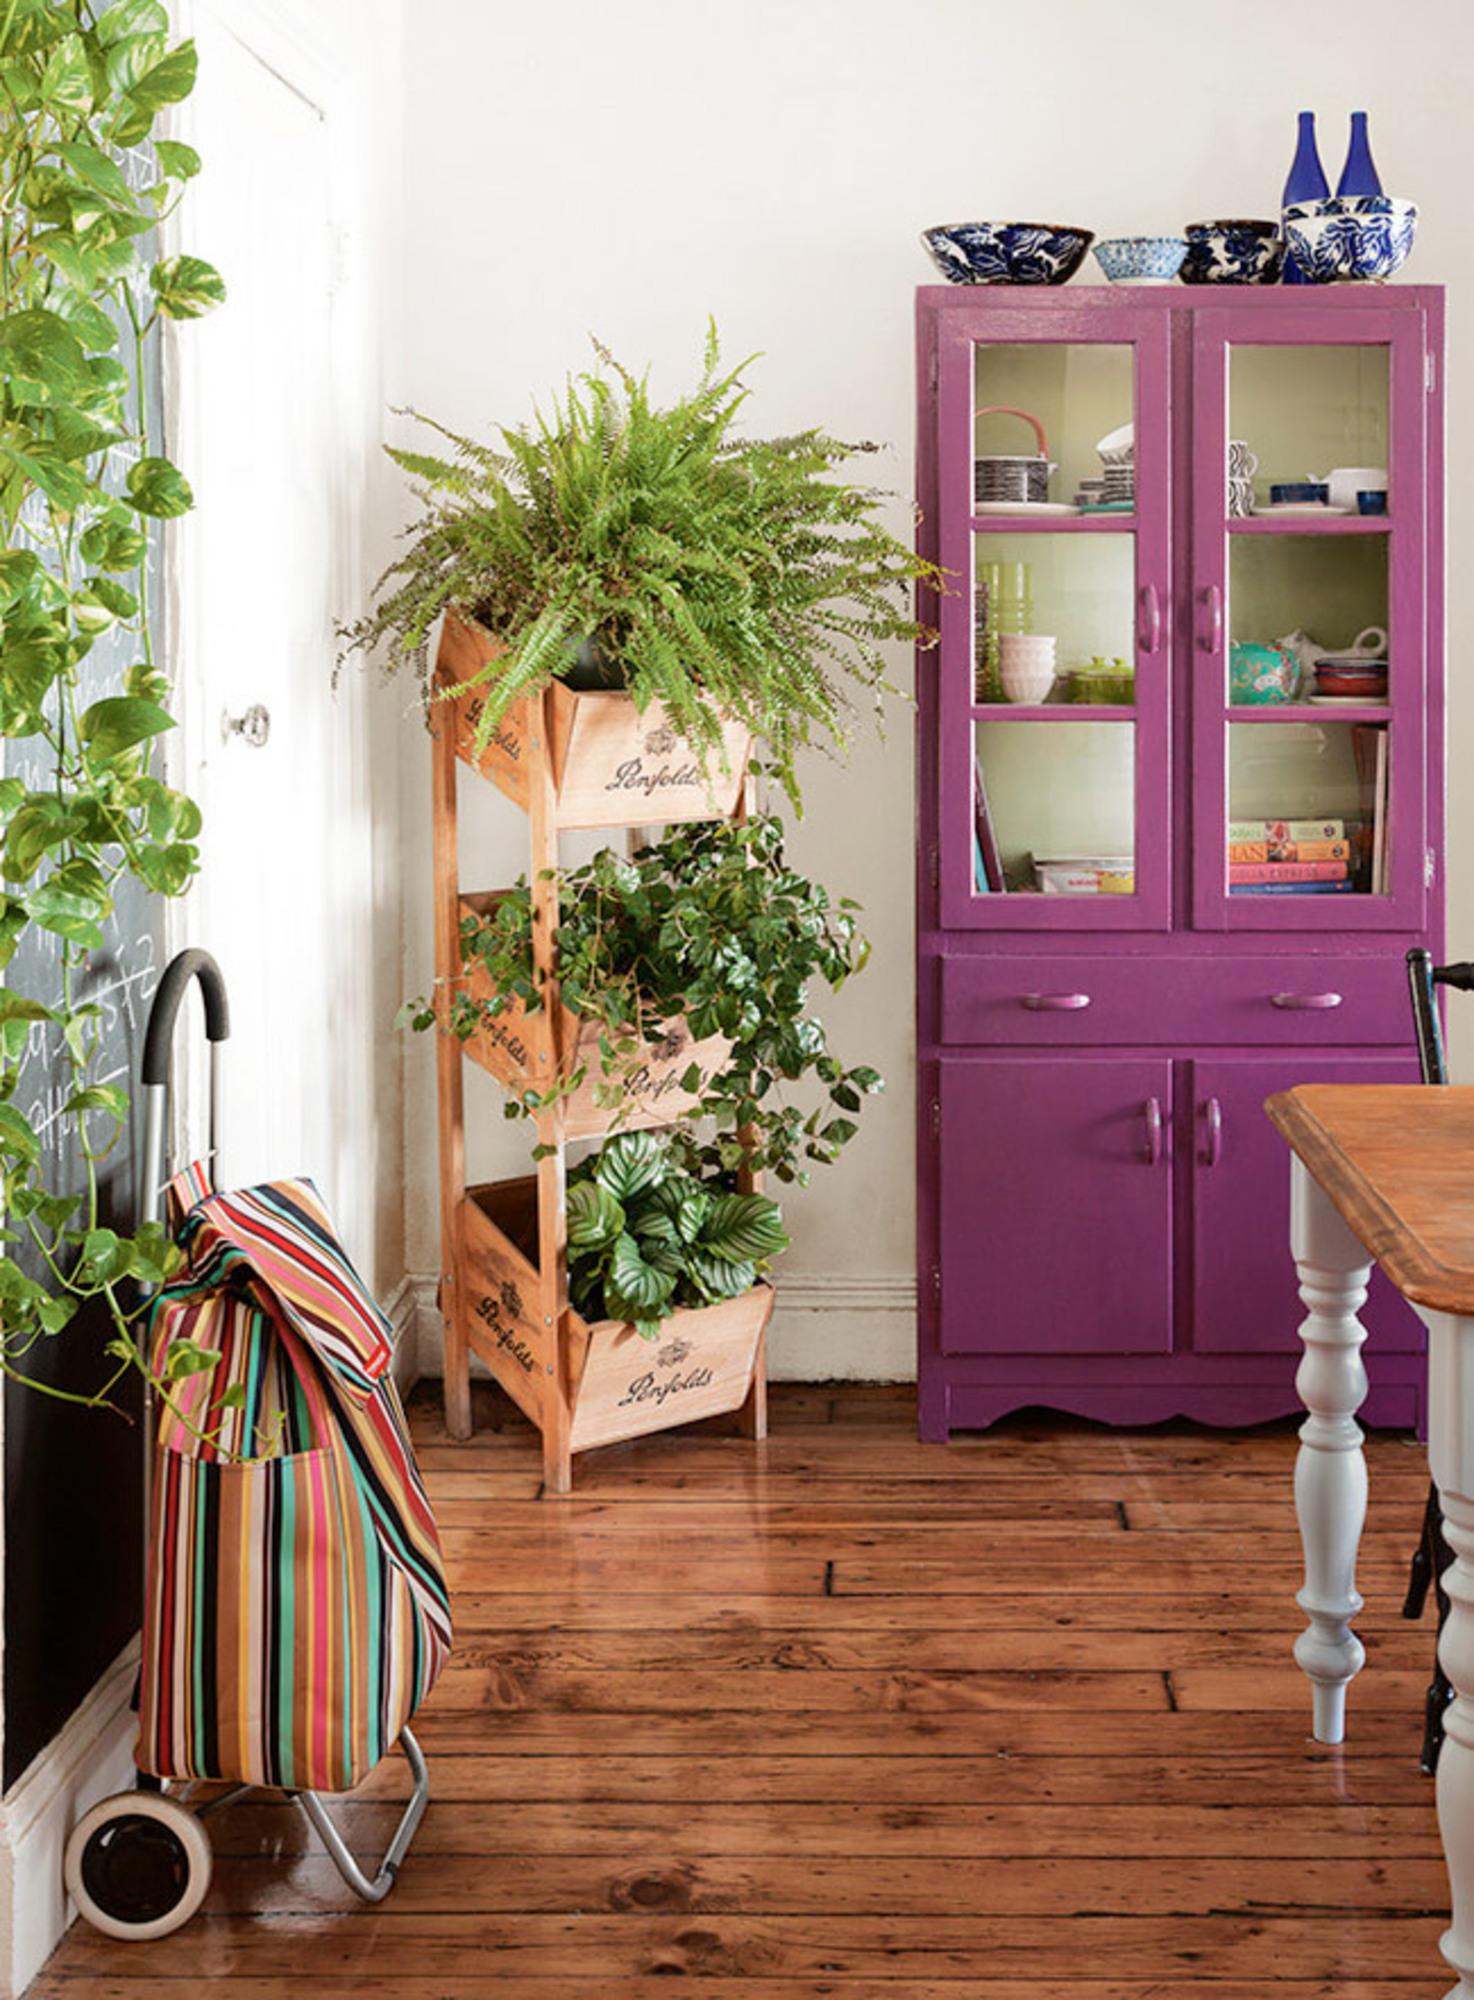 Plantas dentro de casa casa de valentina for Plantas de casa para interior